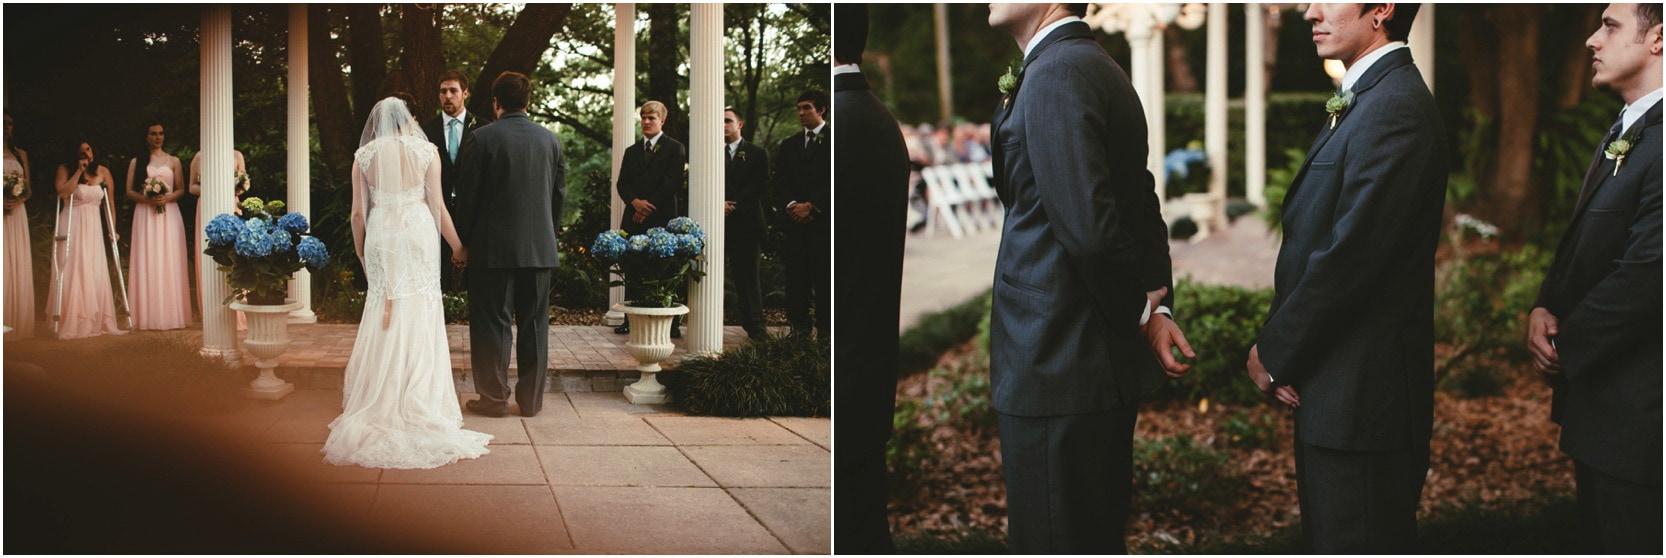 naomijacob_covington_wedding__337_blogstomped